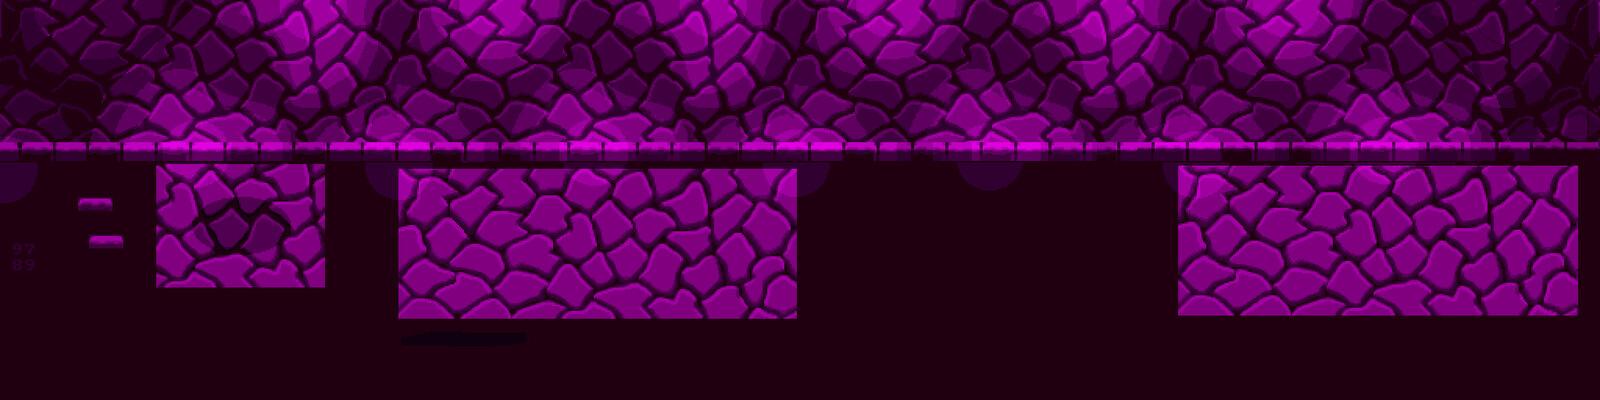 Floor texture to treasure chamber